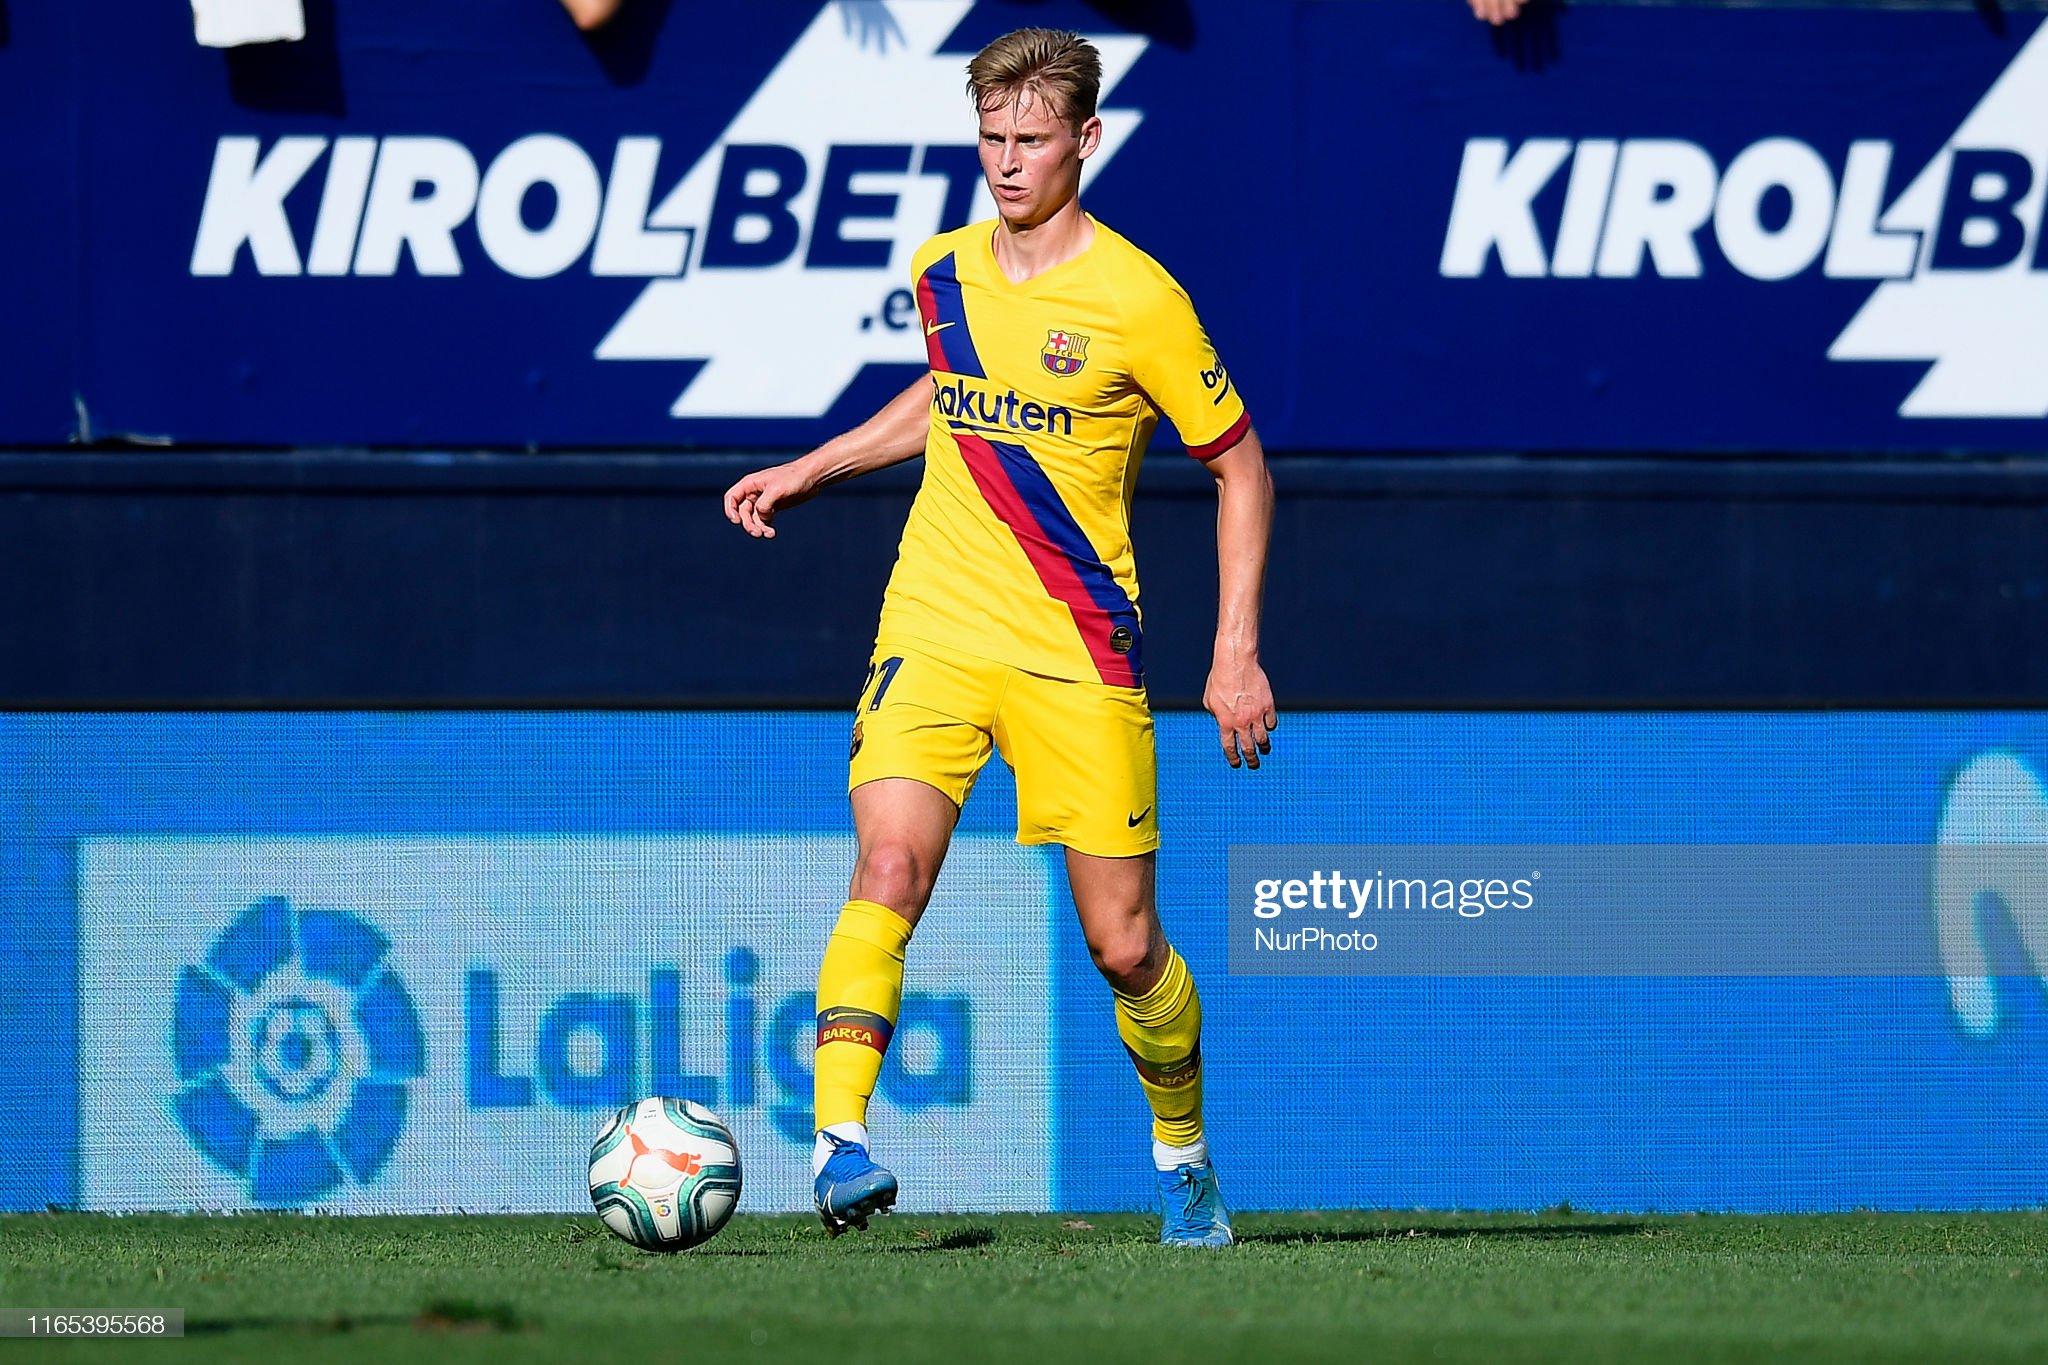 صور مباراة : أوساسونا - برشلونة 2-2 ( 31-08-2019 )  Frenkie-de-jong-of-barcelona-in-action-during-the-liga-match-between-picture-id1165395568?s=2048x2048